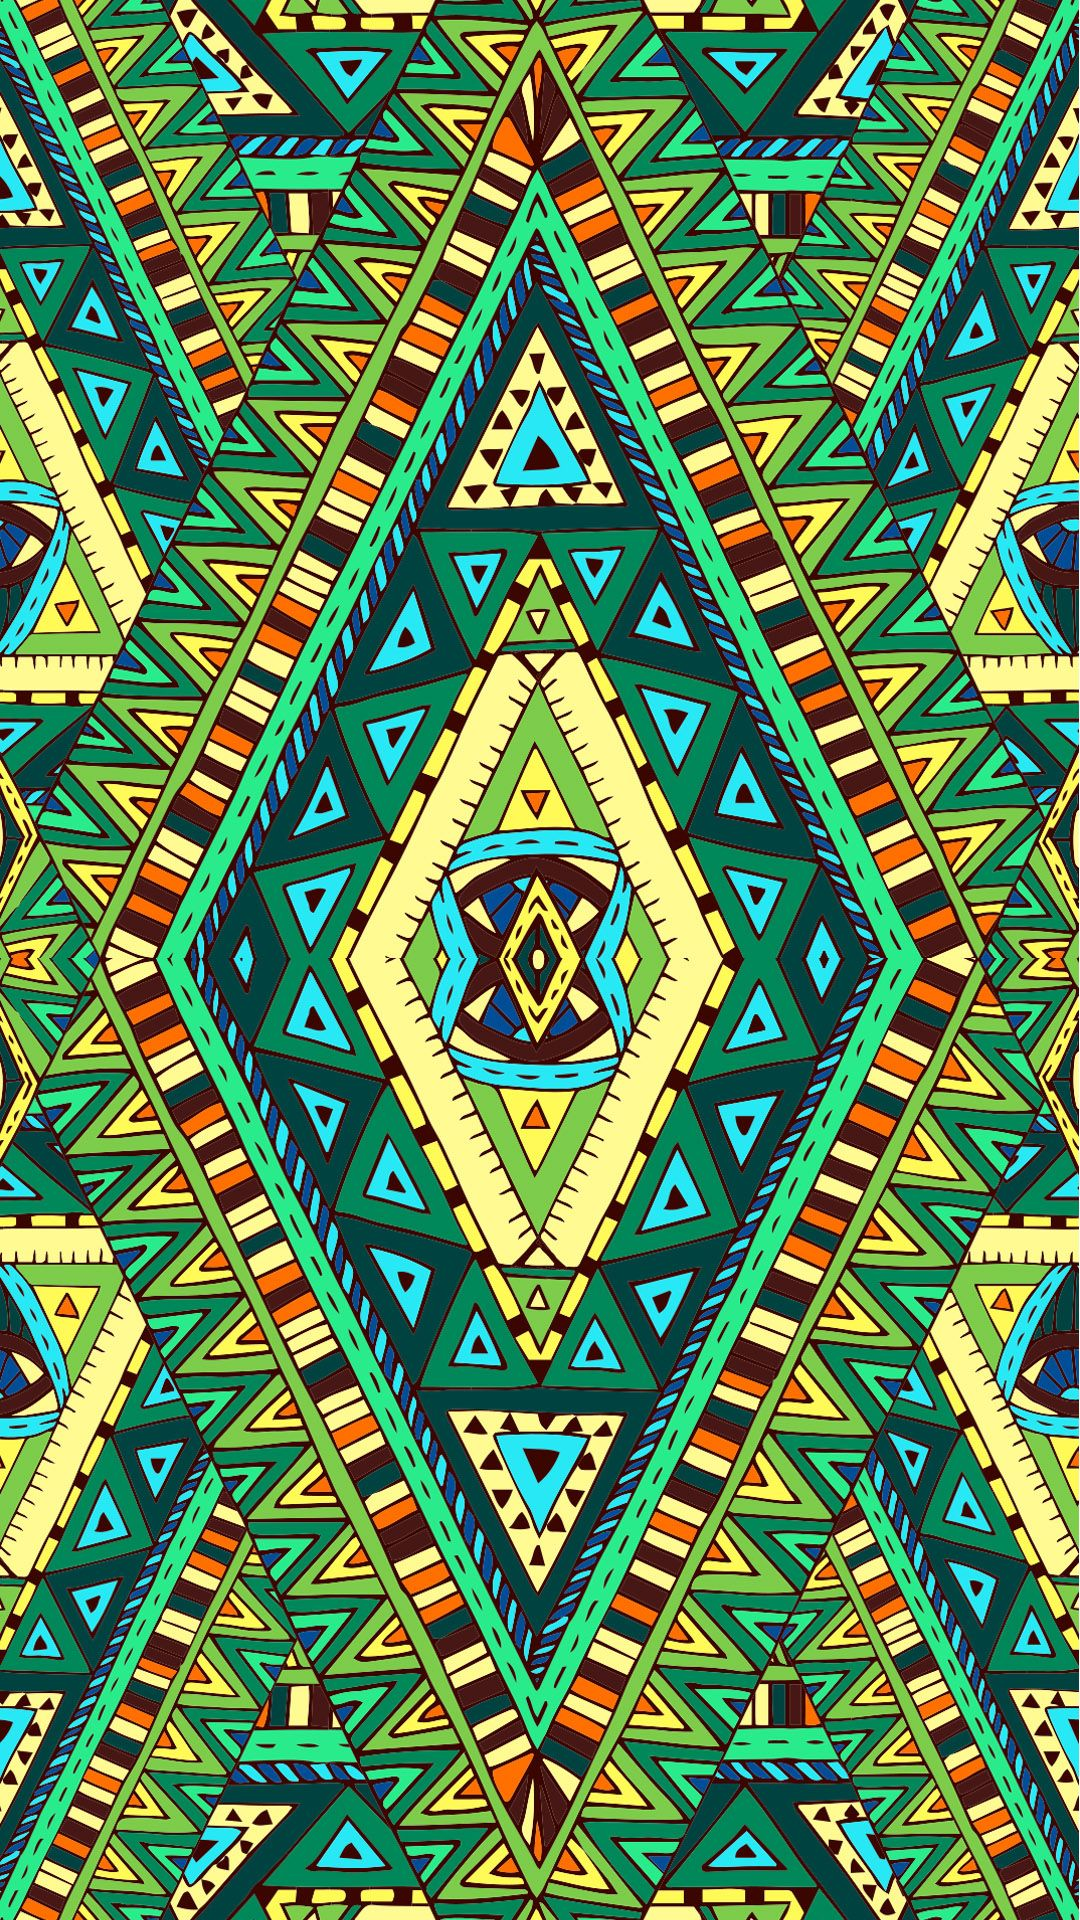 Wallpaper iphone green - Etnik Desen Sevenler I In Renkli Wallpaperlar Ethnic Etnik Green Wallpaper